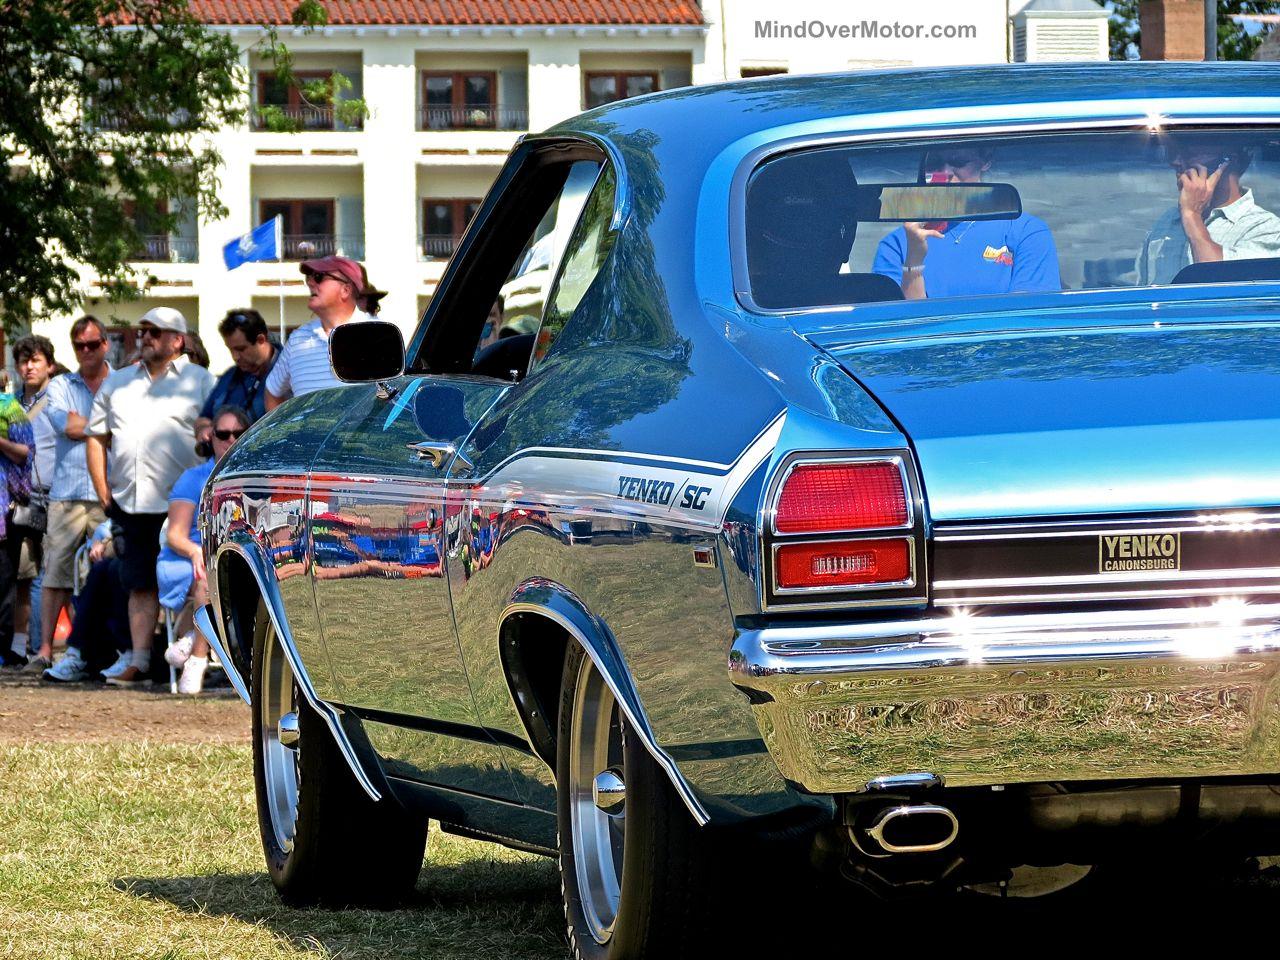 Greenwich Chevrolet Yenko